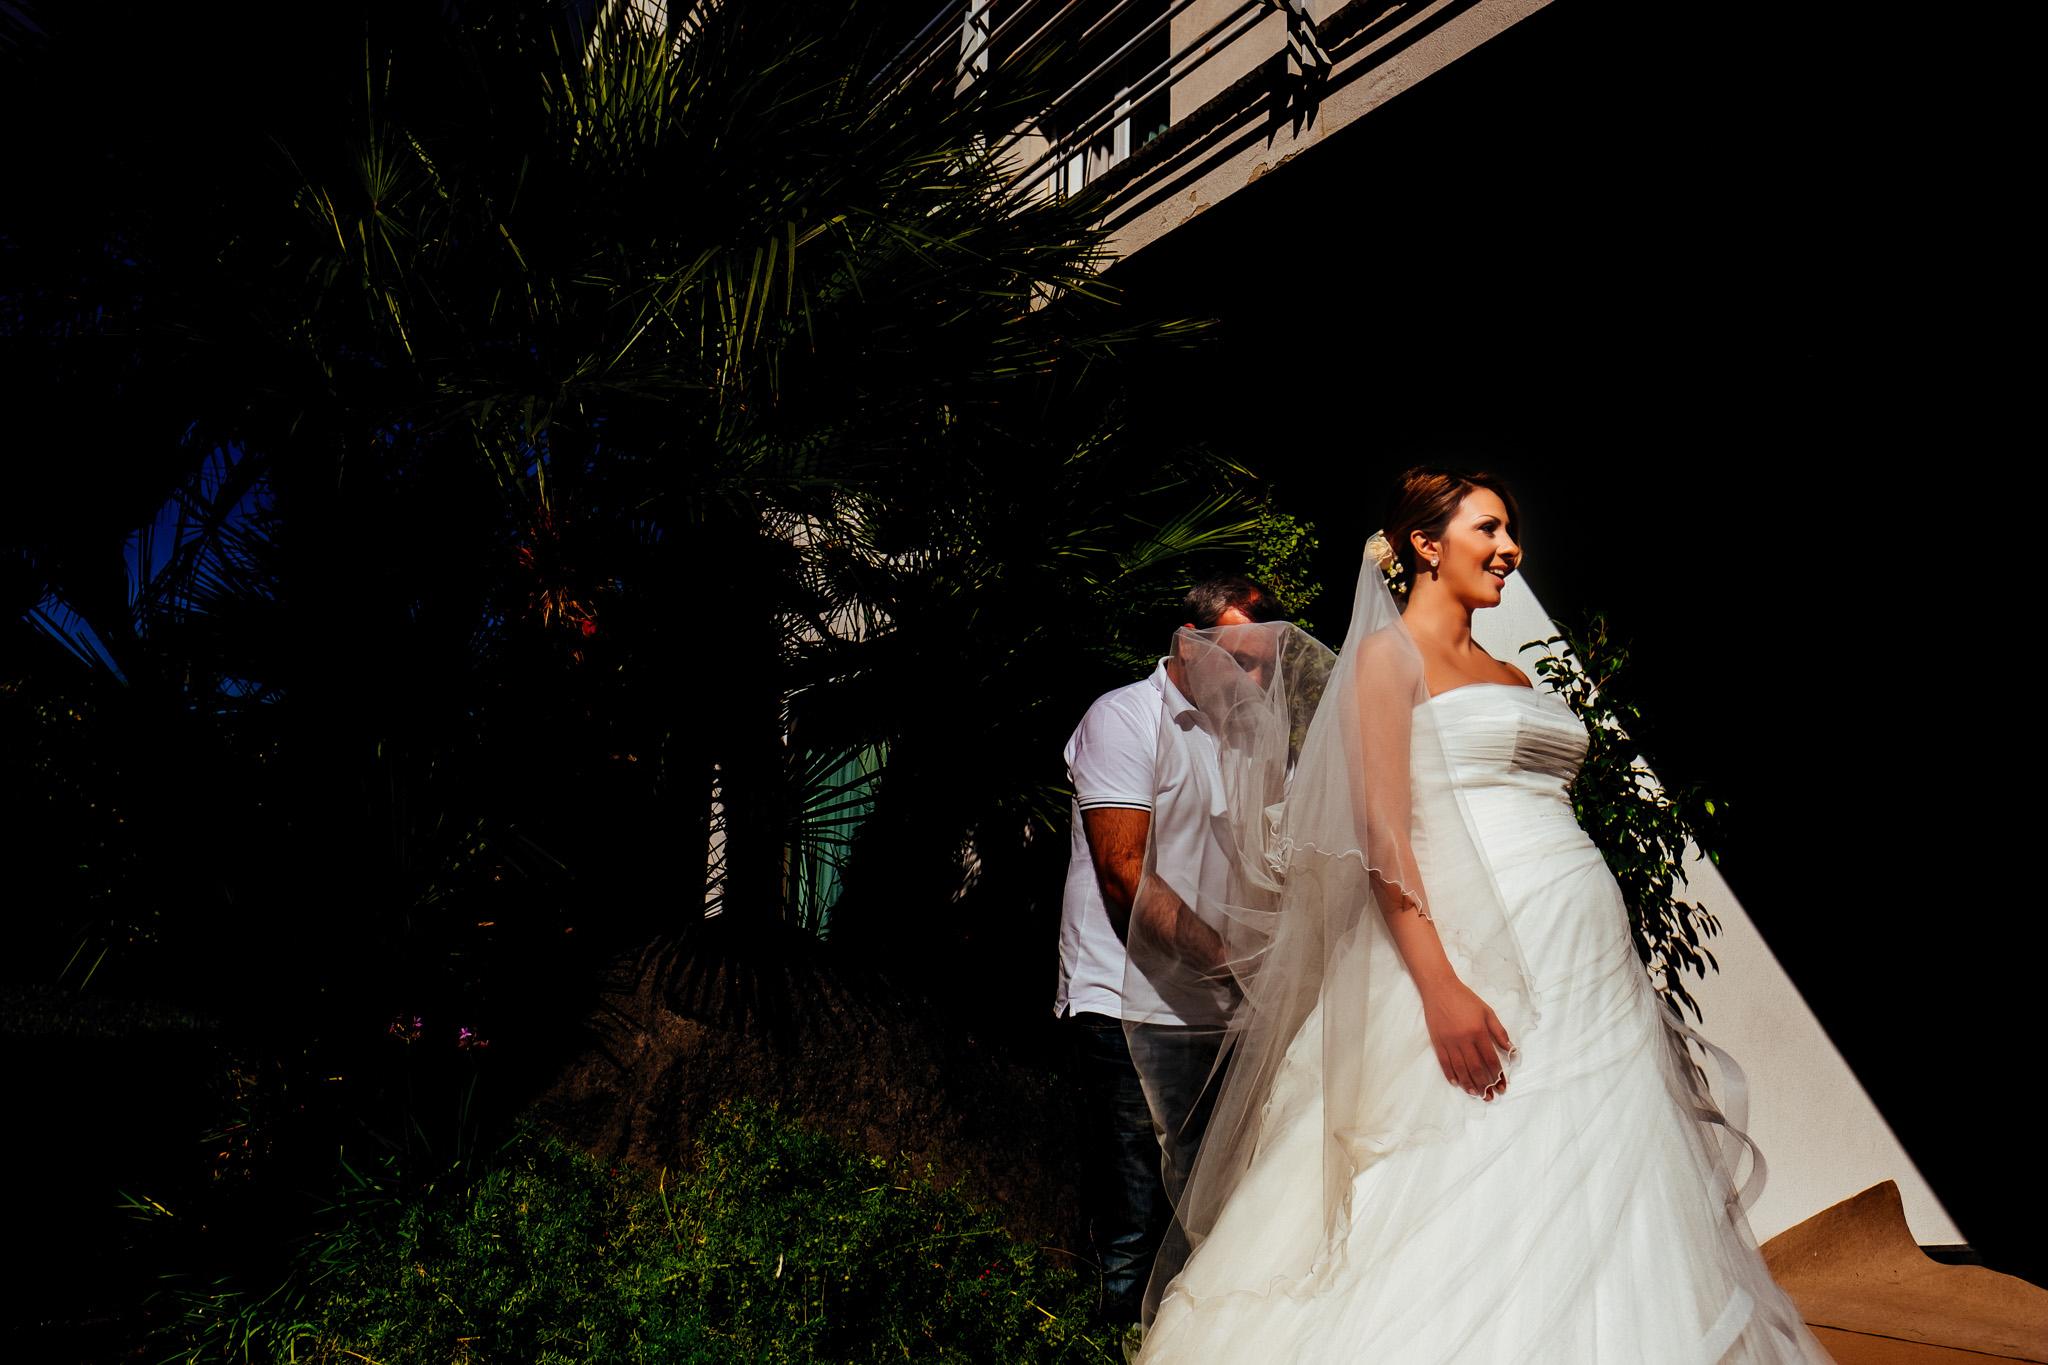 matrimonio-a-catania-17.jpg